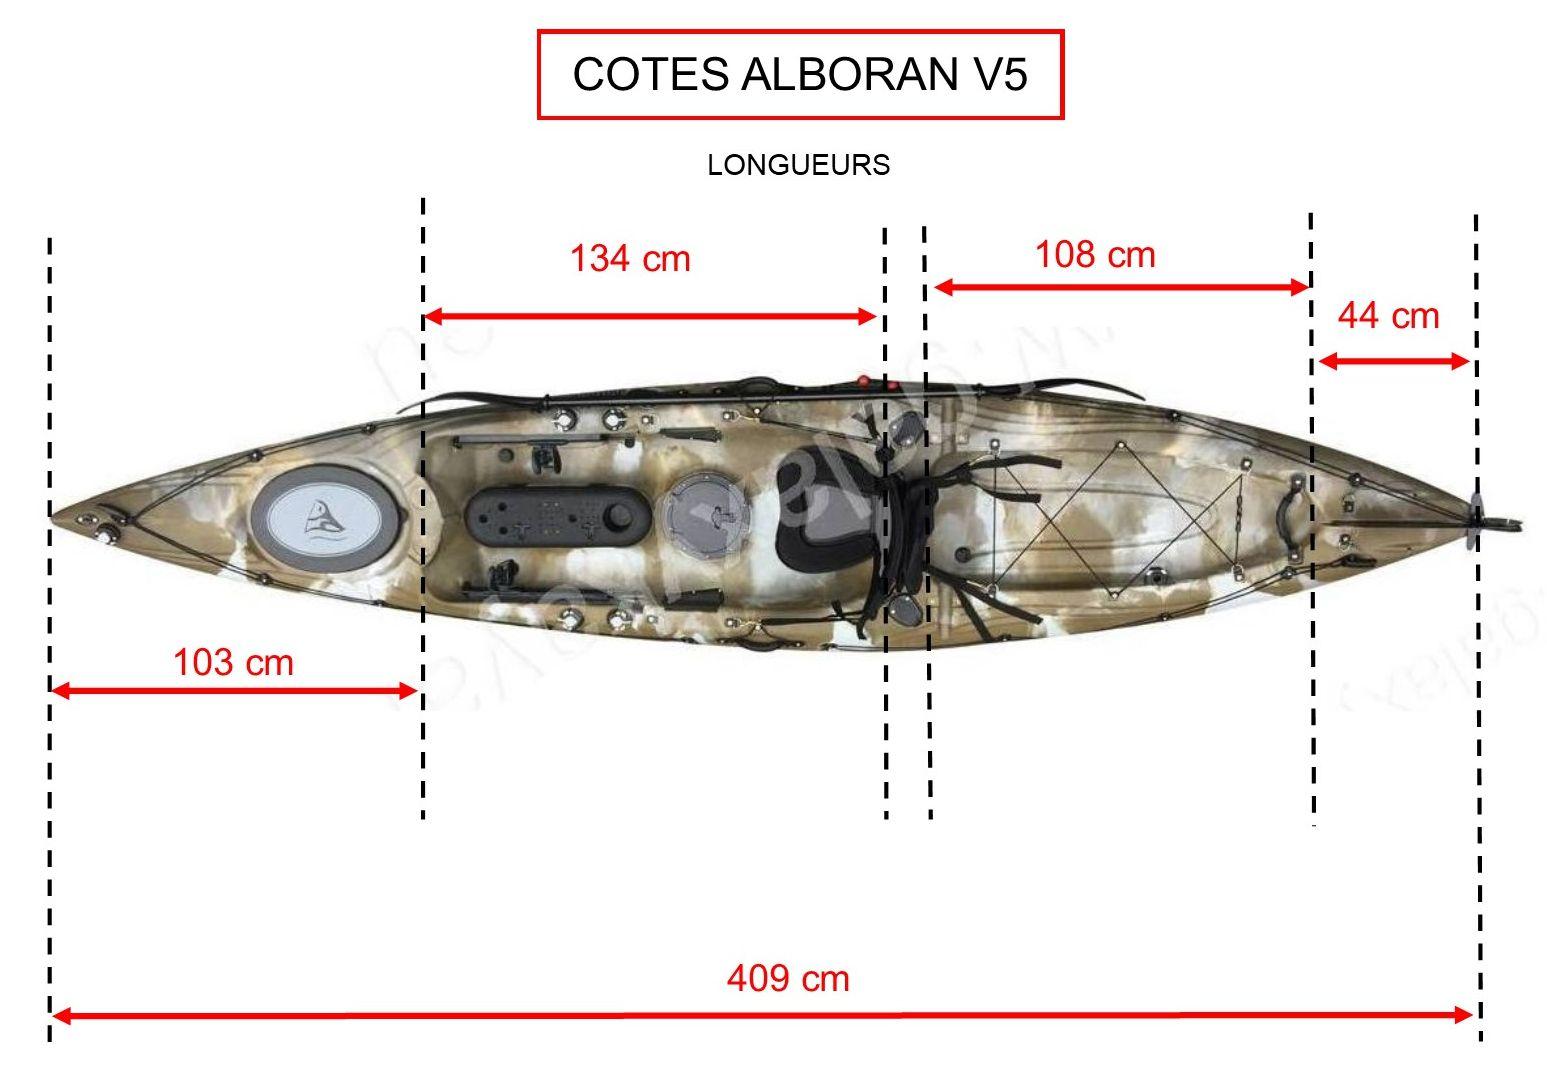 Alboran (GALAXY KAYAK) Cotes-longueurs